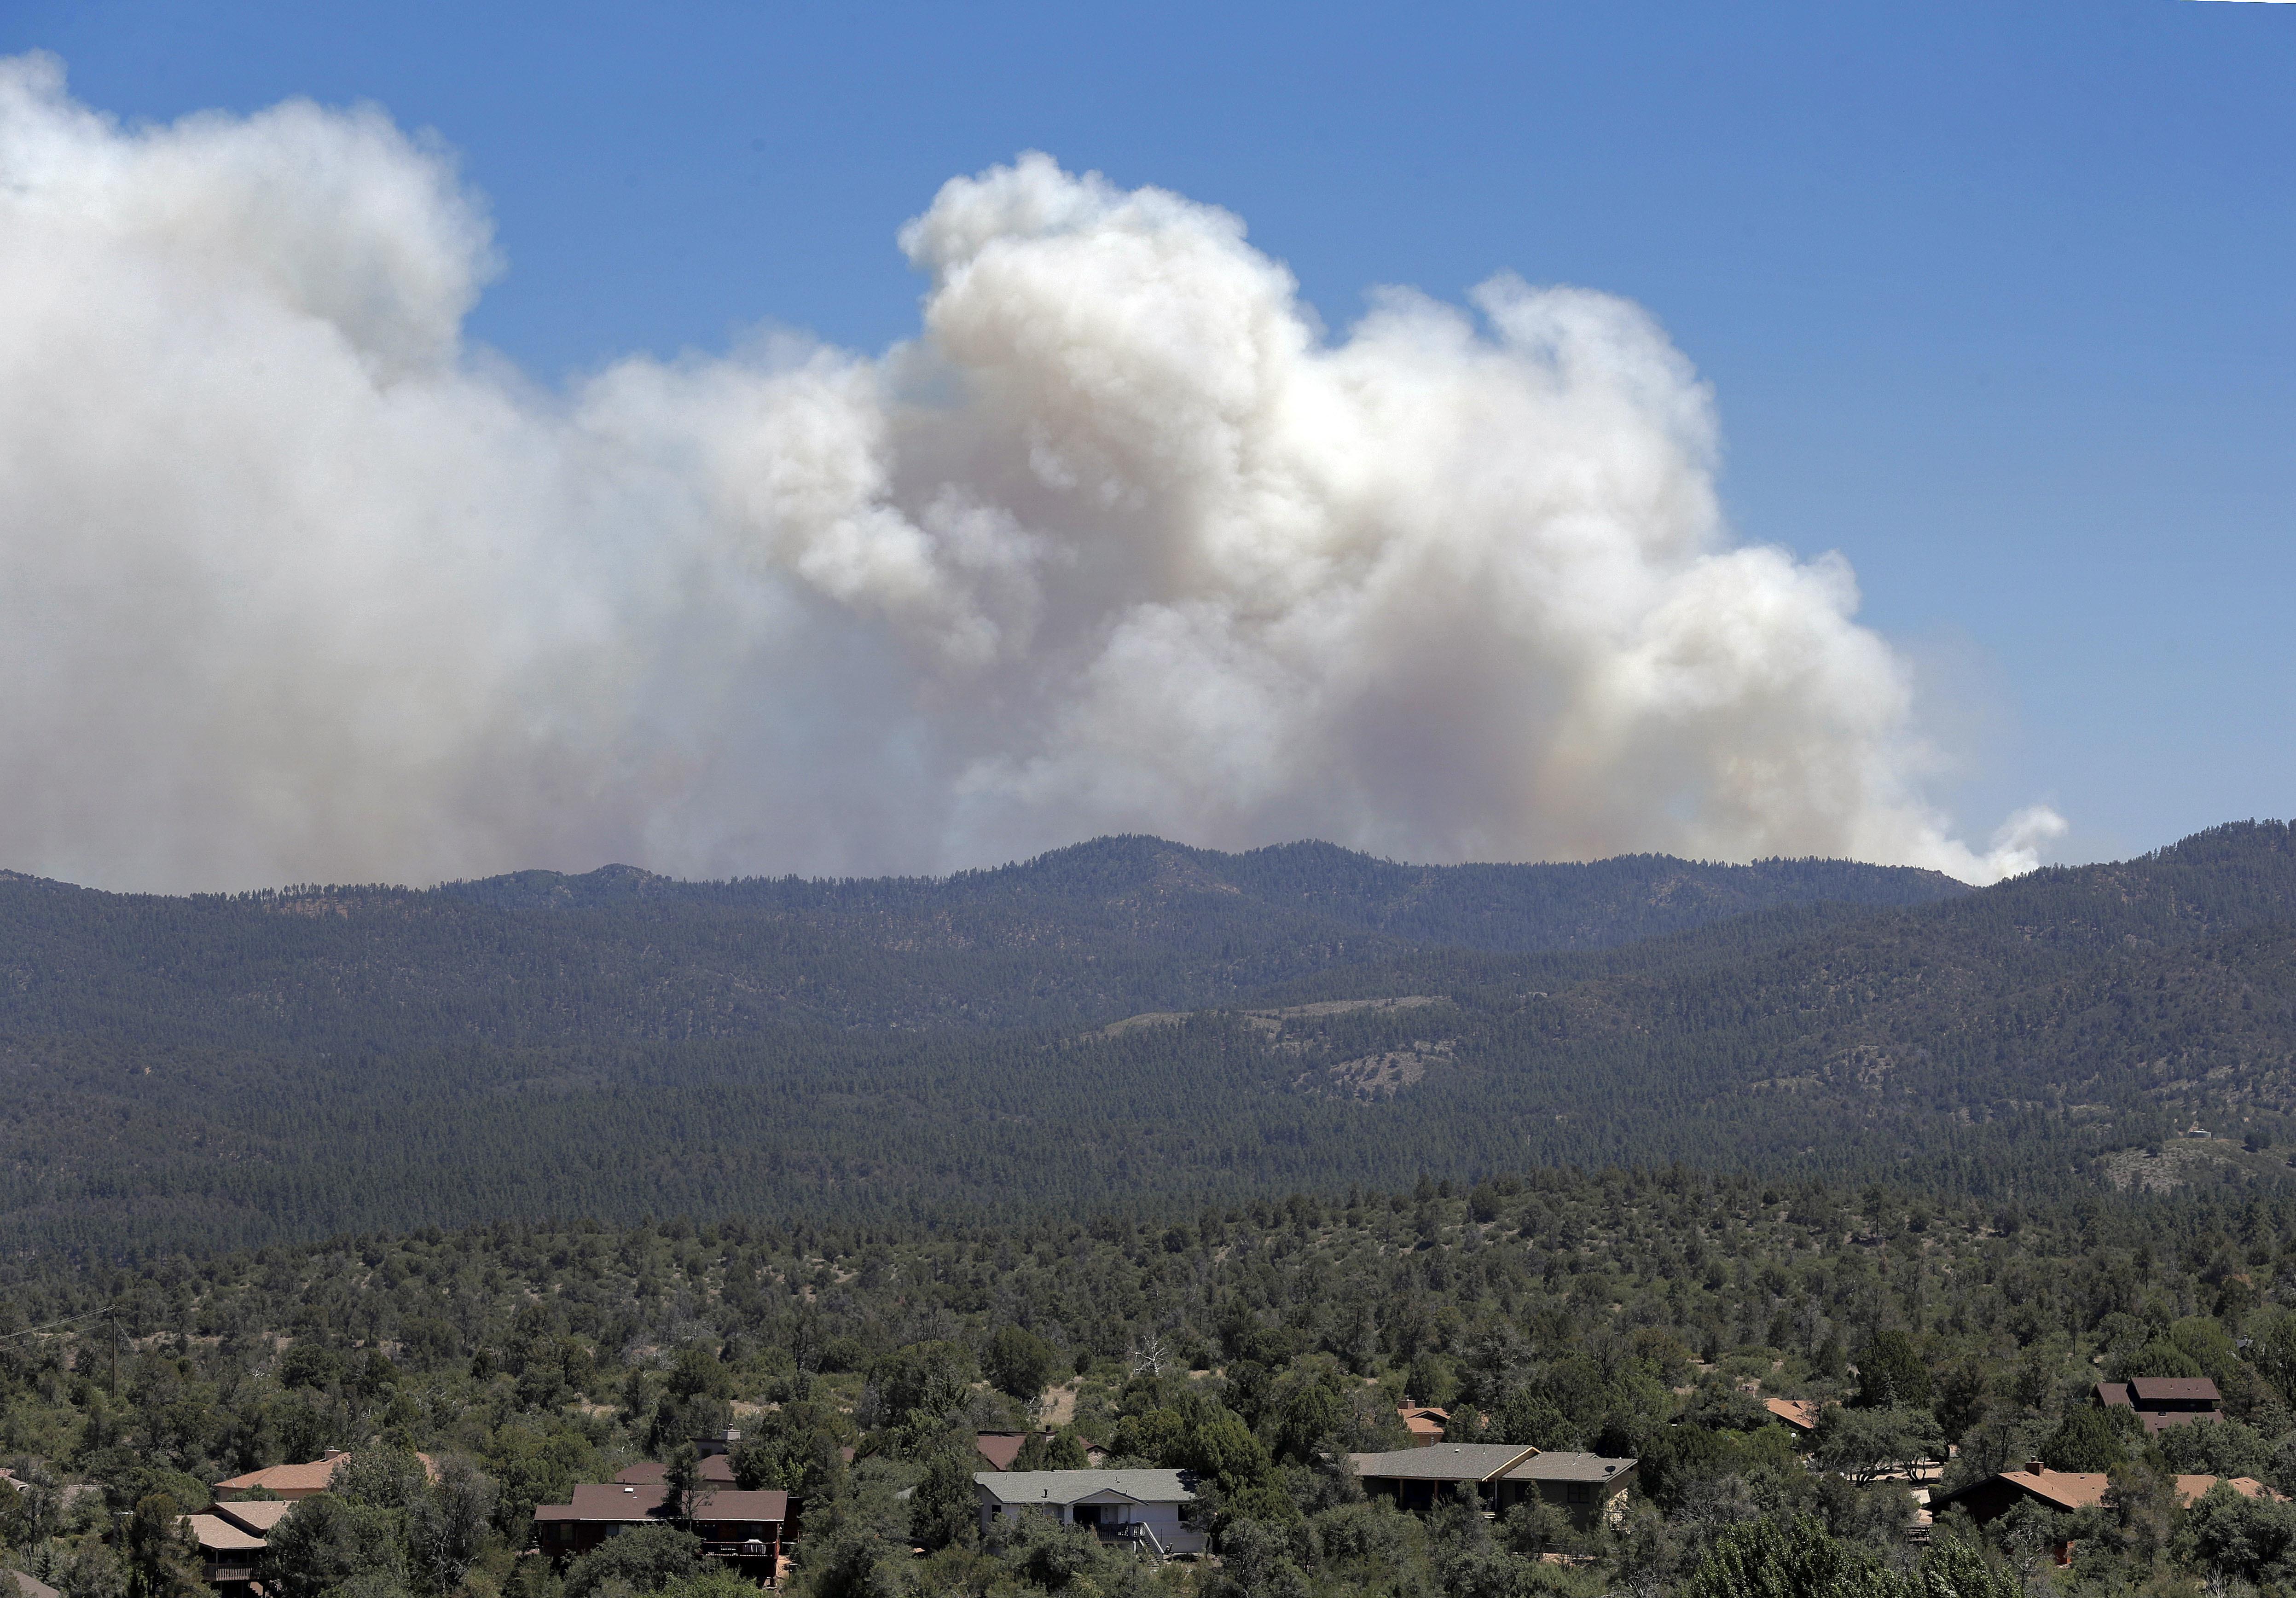 Arizona yavapai county dewey - Thousands In Arizona Flee Flames As Wildfires Sweep West The Spokesman Review